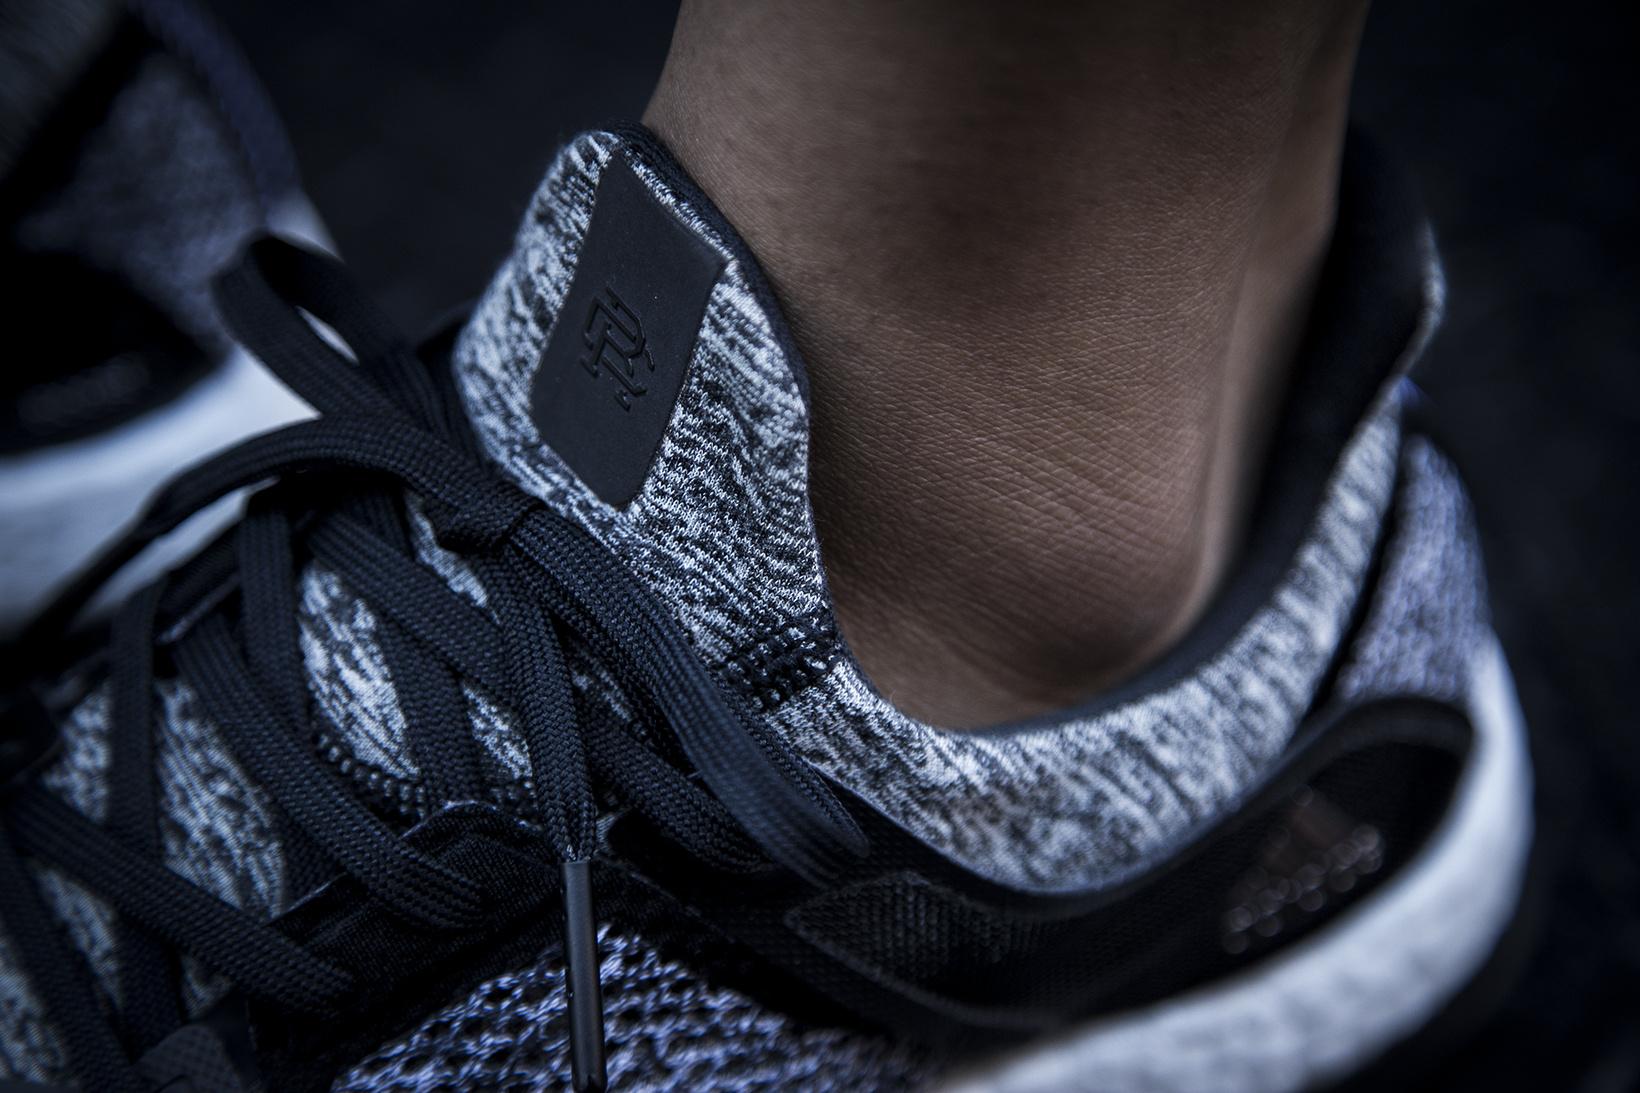 reigning-champ-adidas-pureboost-closer-look-5.jpg